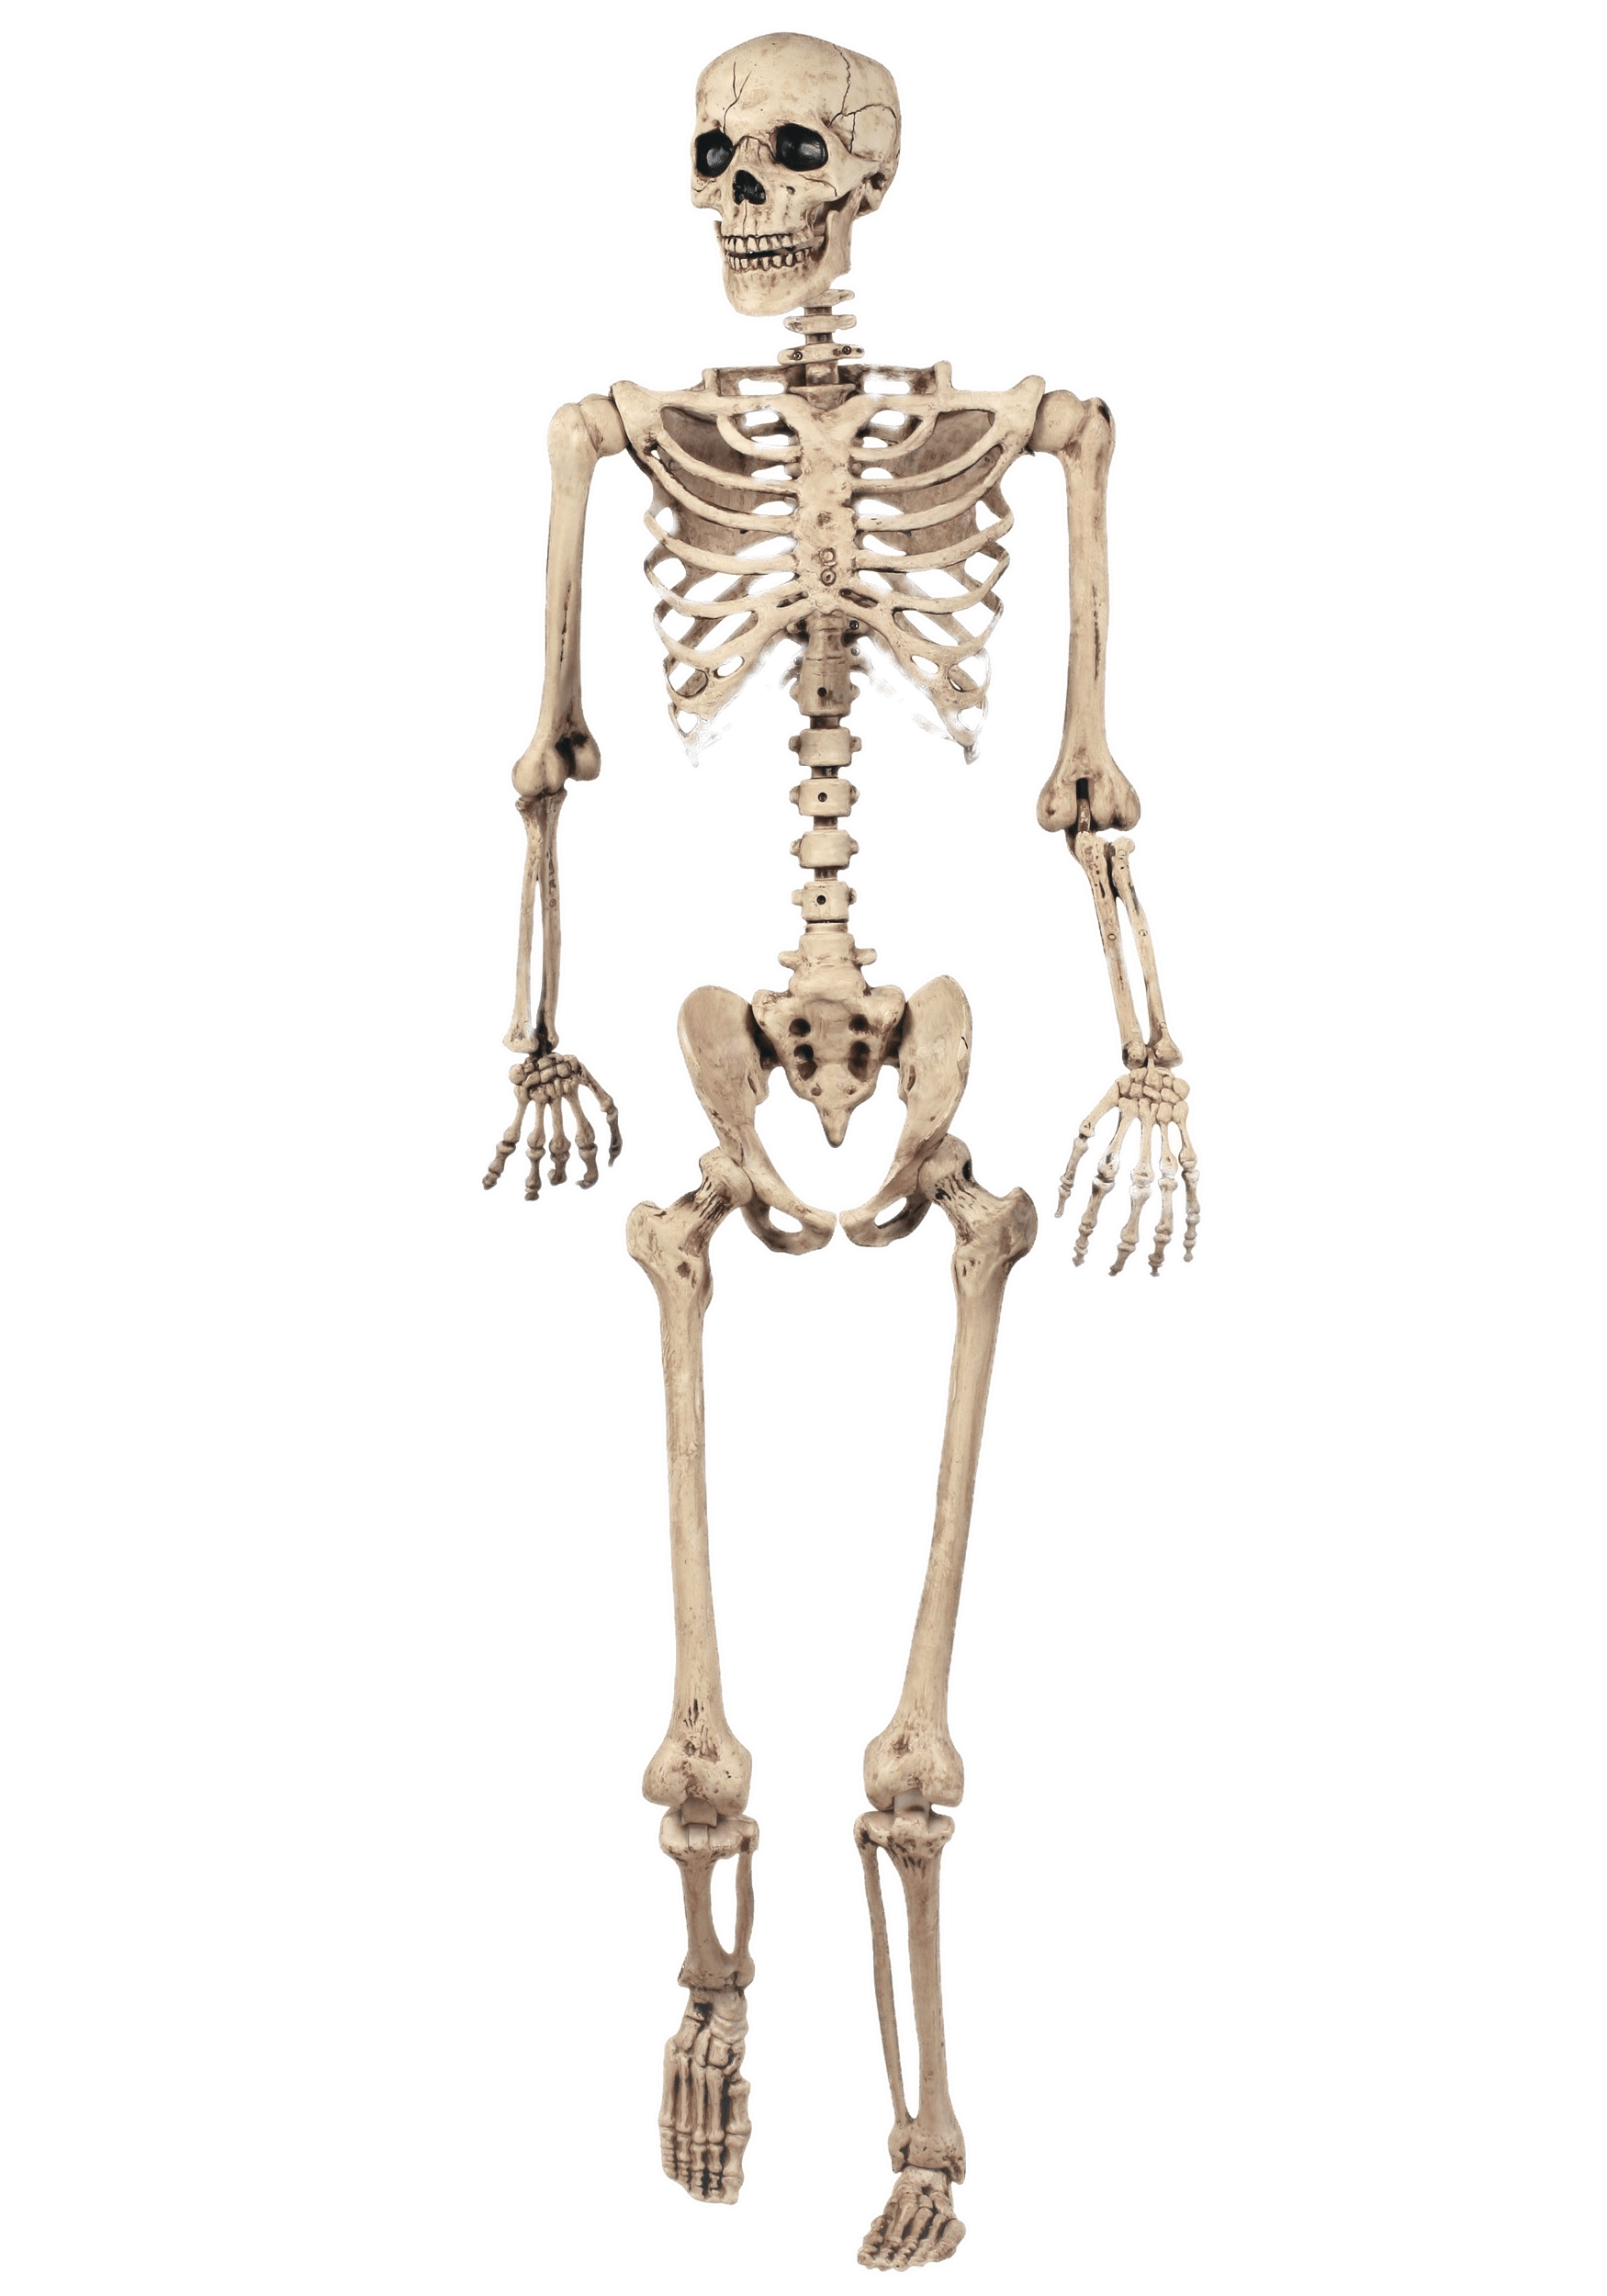 royalty free stock Full Skeleton Model transparent PNG